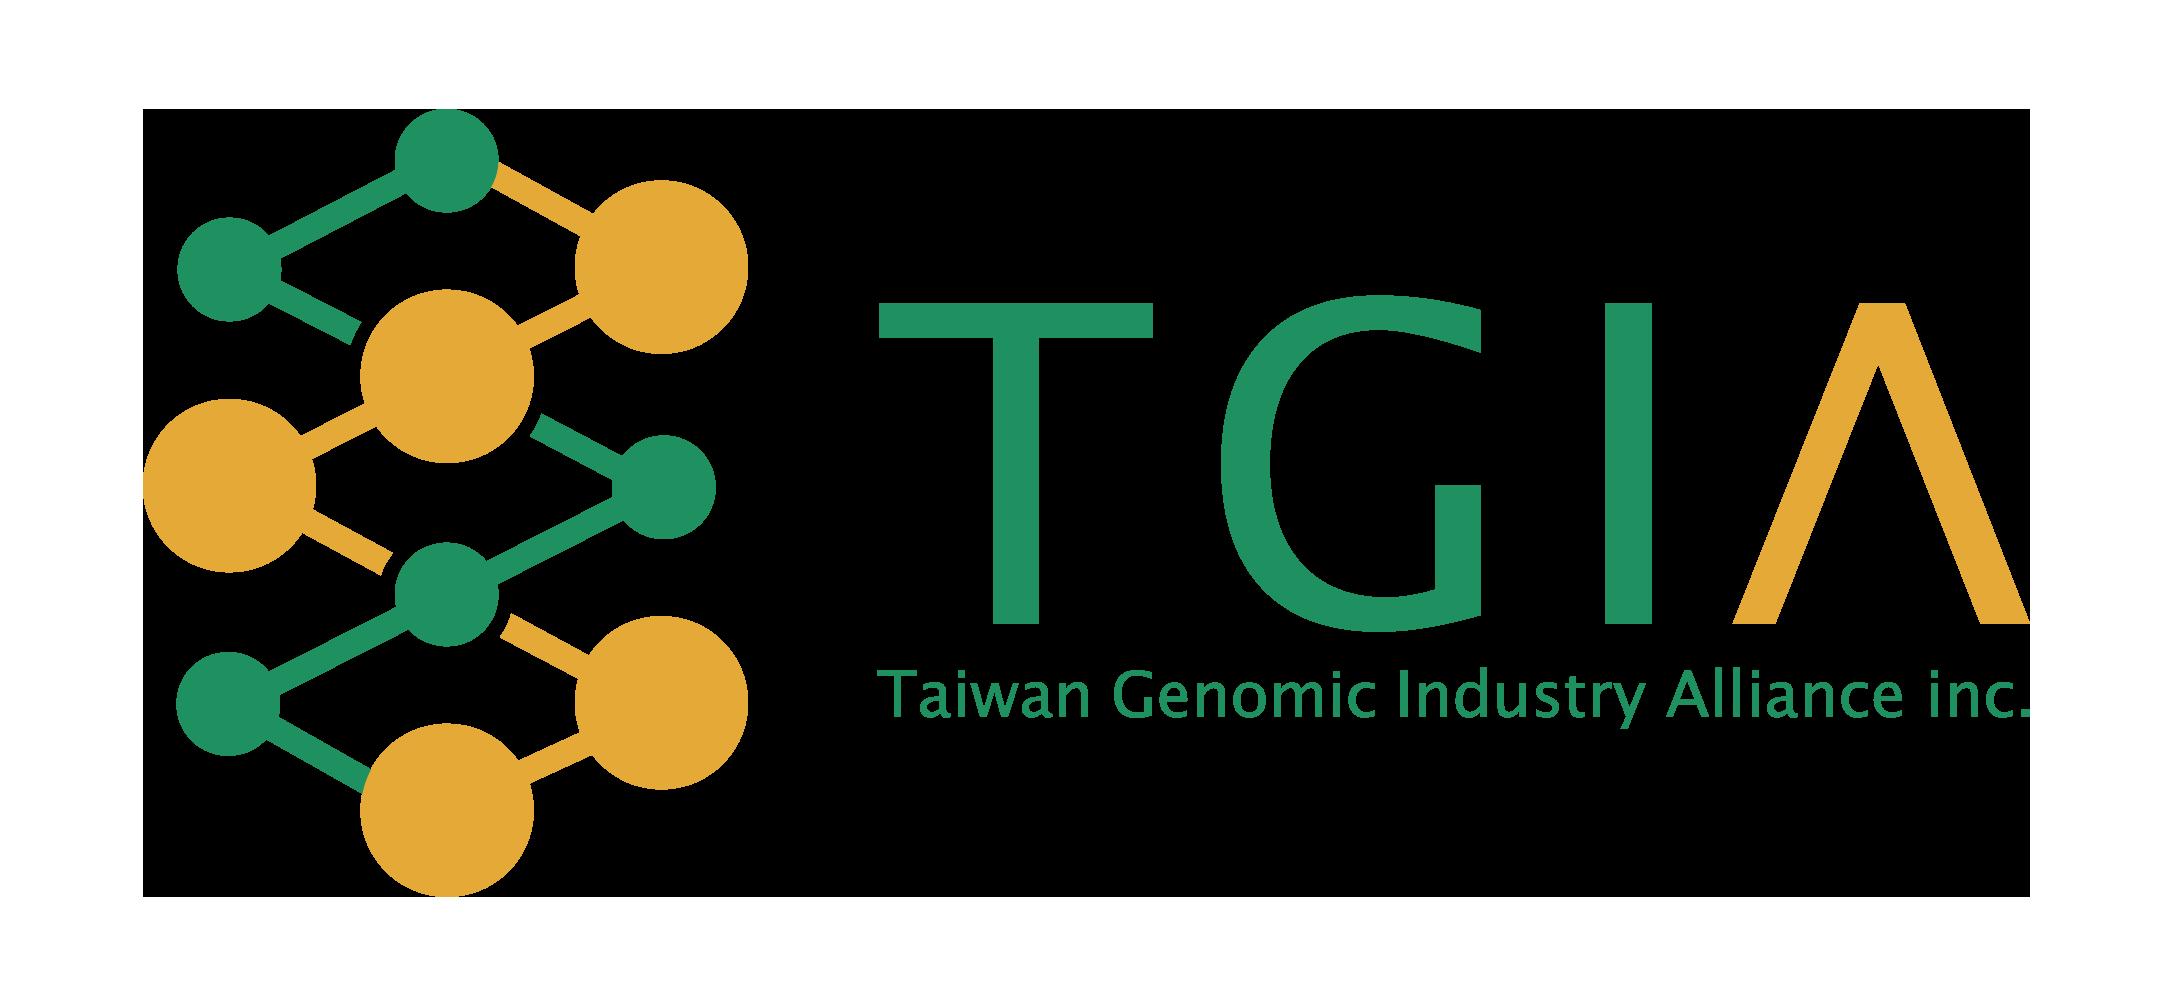 Our co-sponsor - TGIA